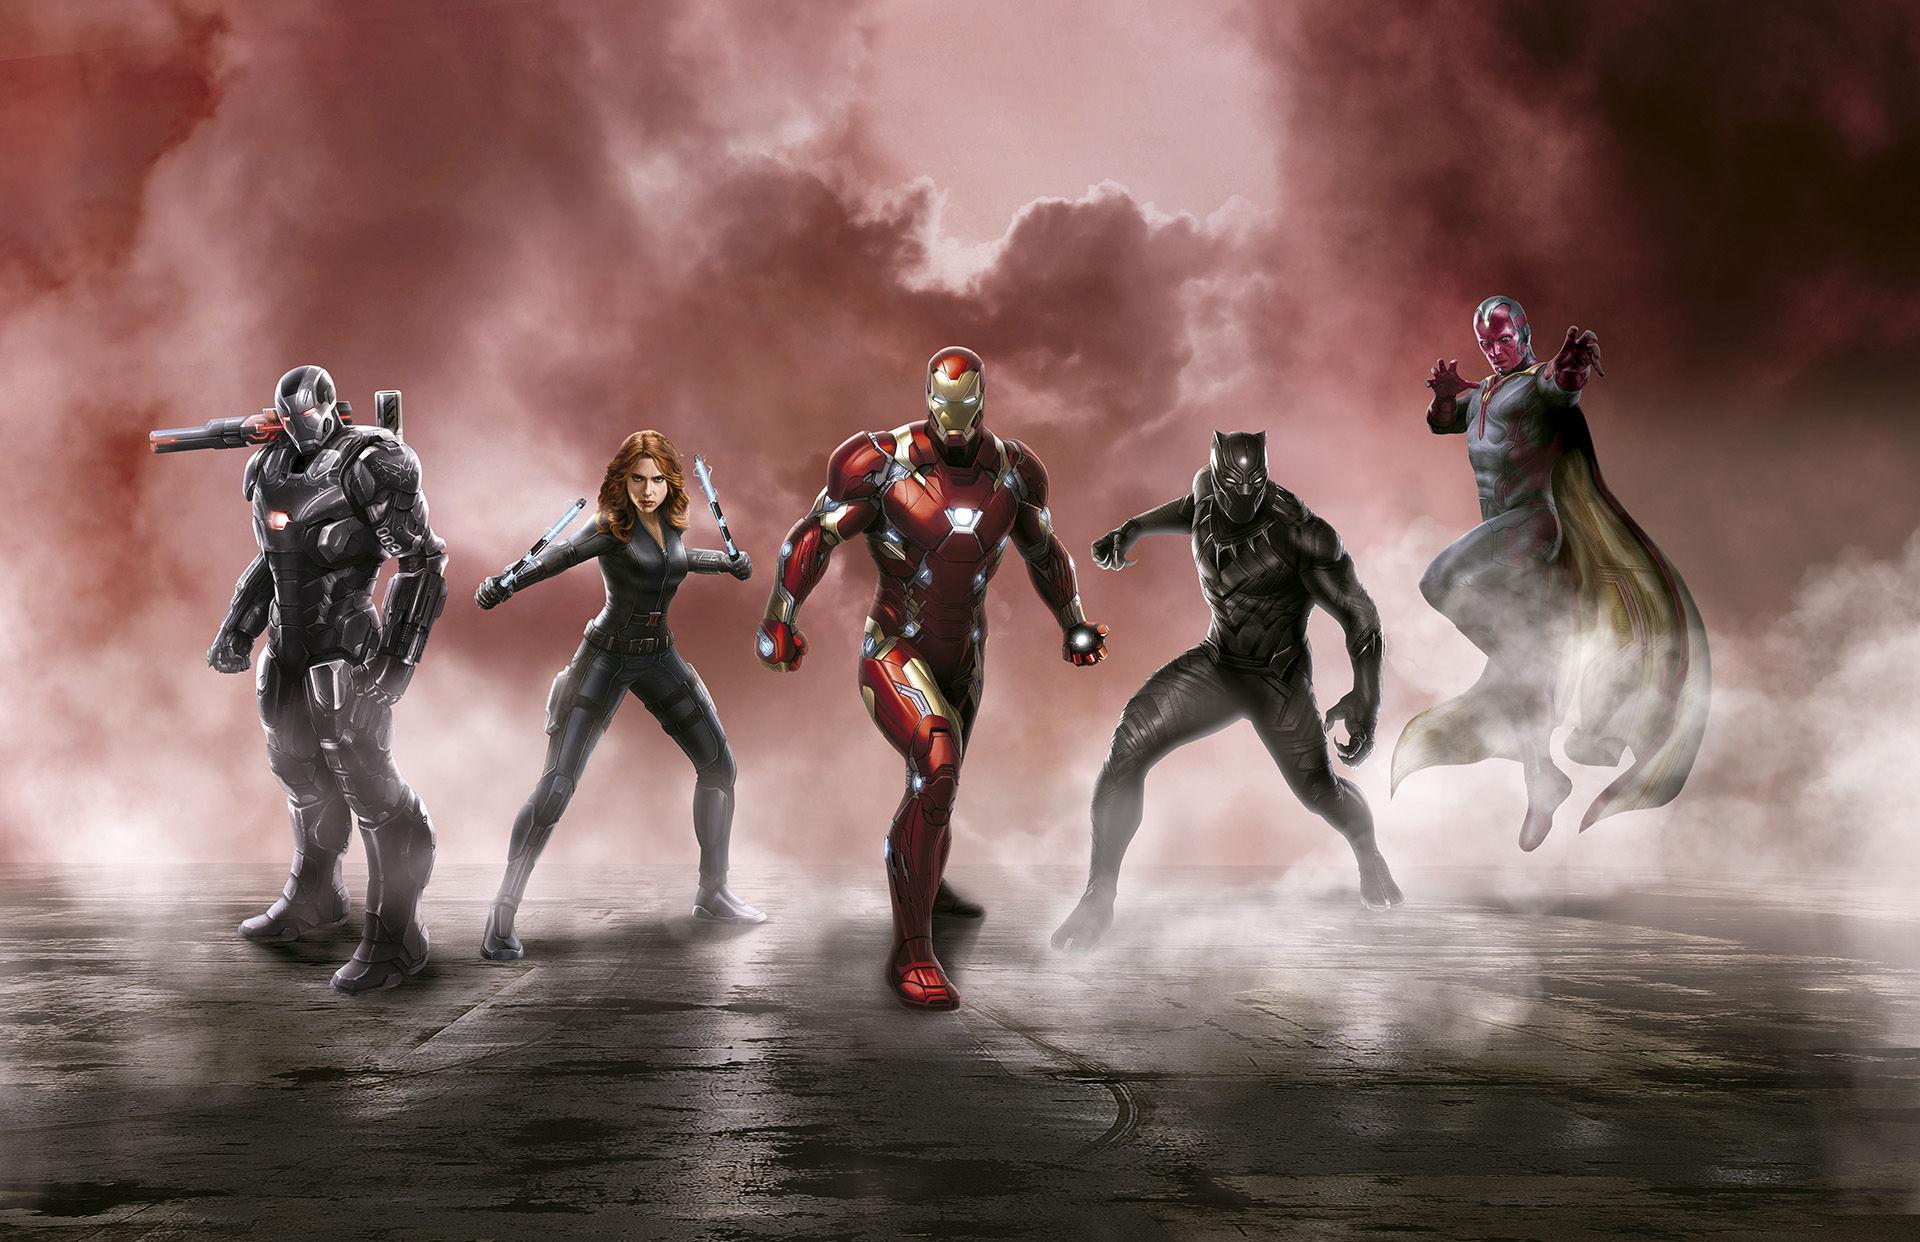 Captain-America-Civil-War-Art-Iron-Man-Team-Bruno-Alves-high-res.jpg